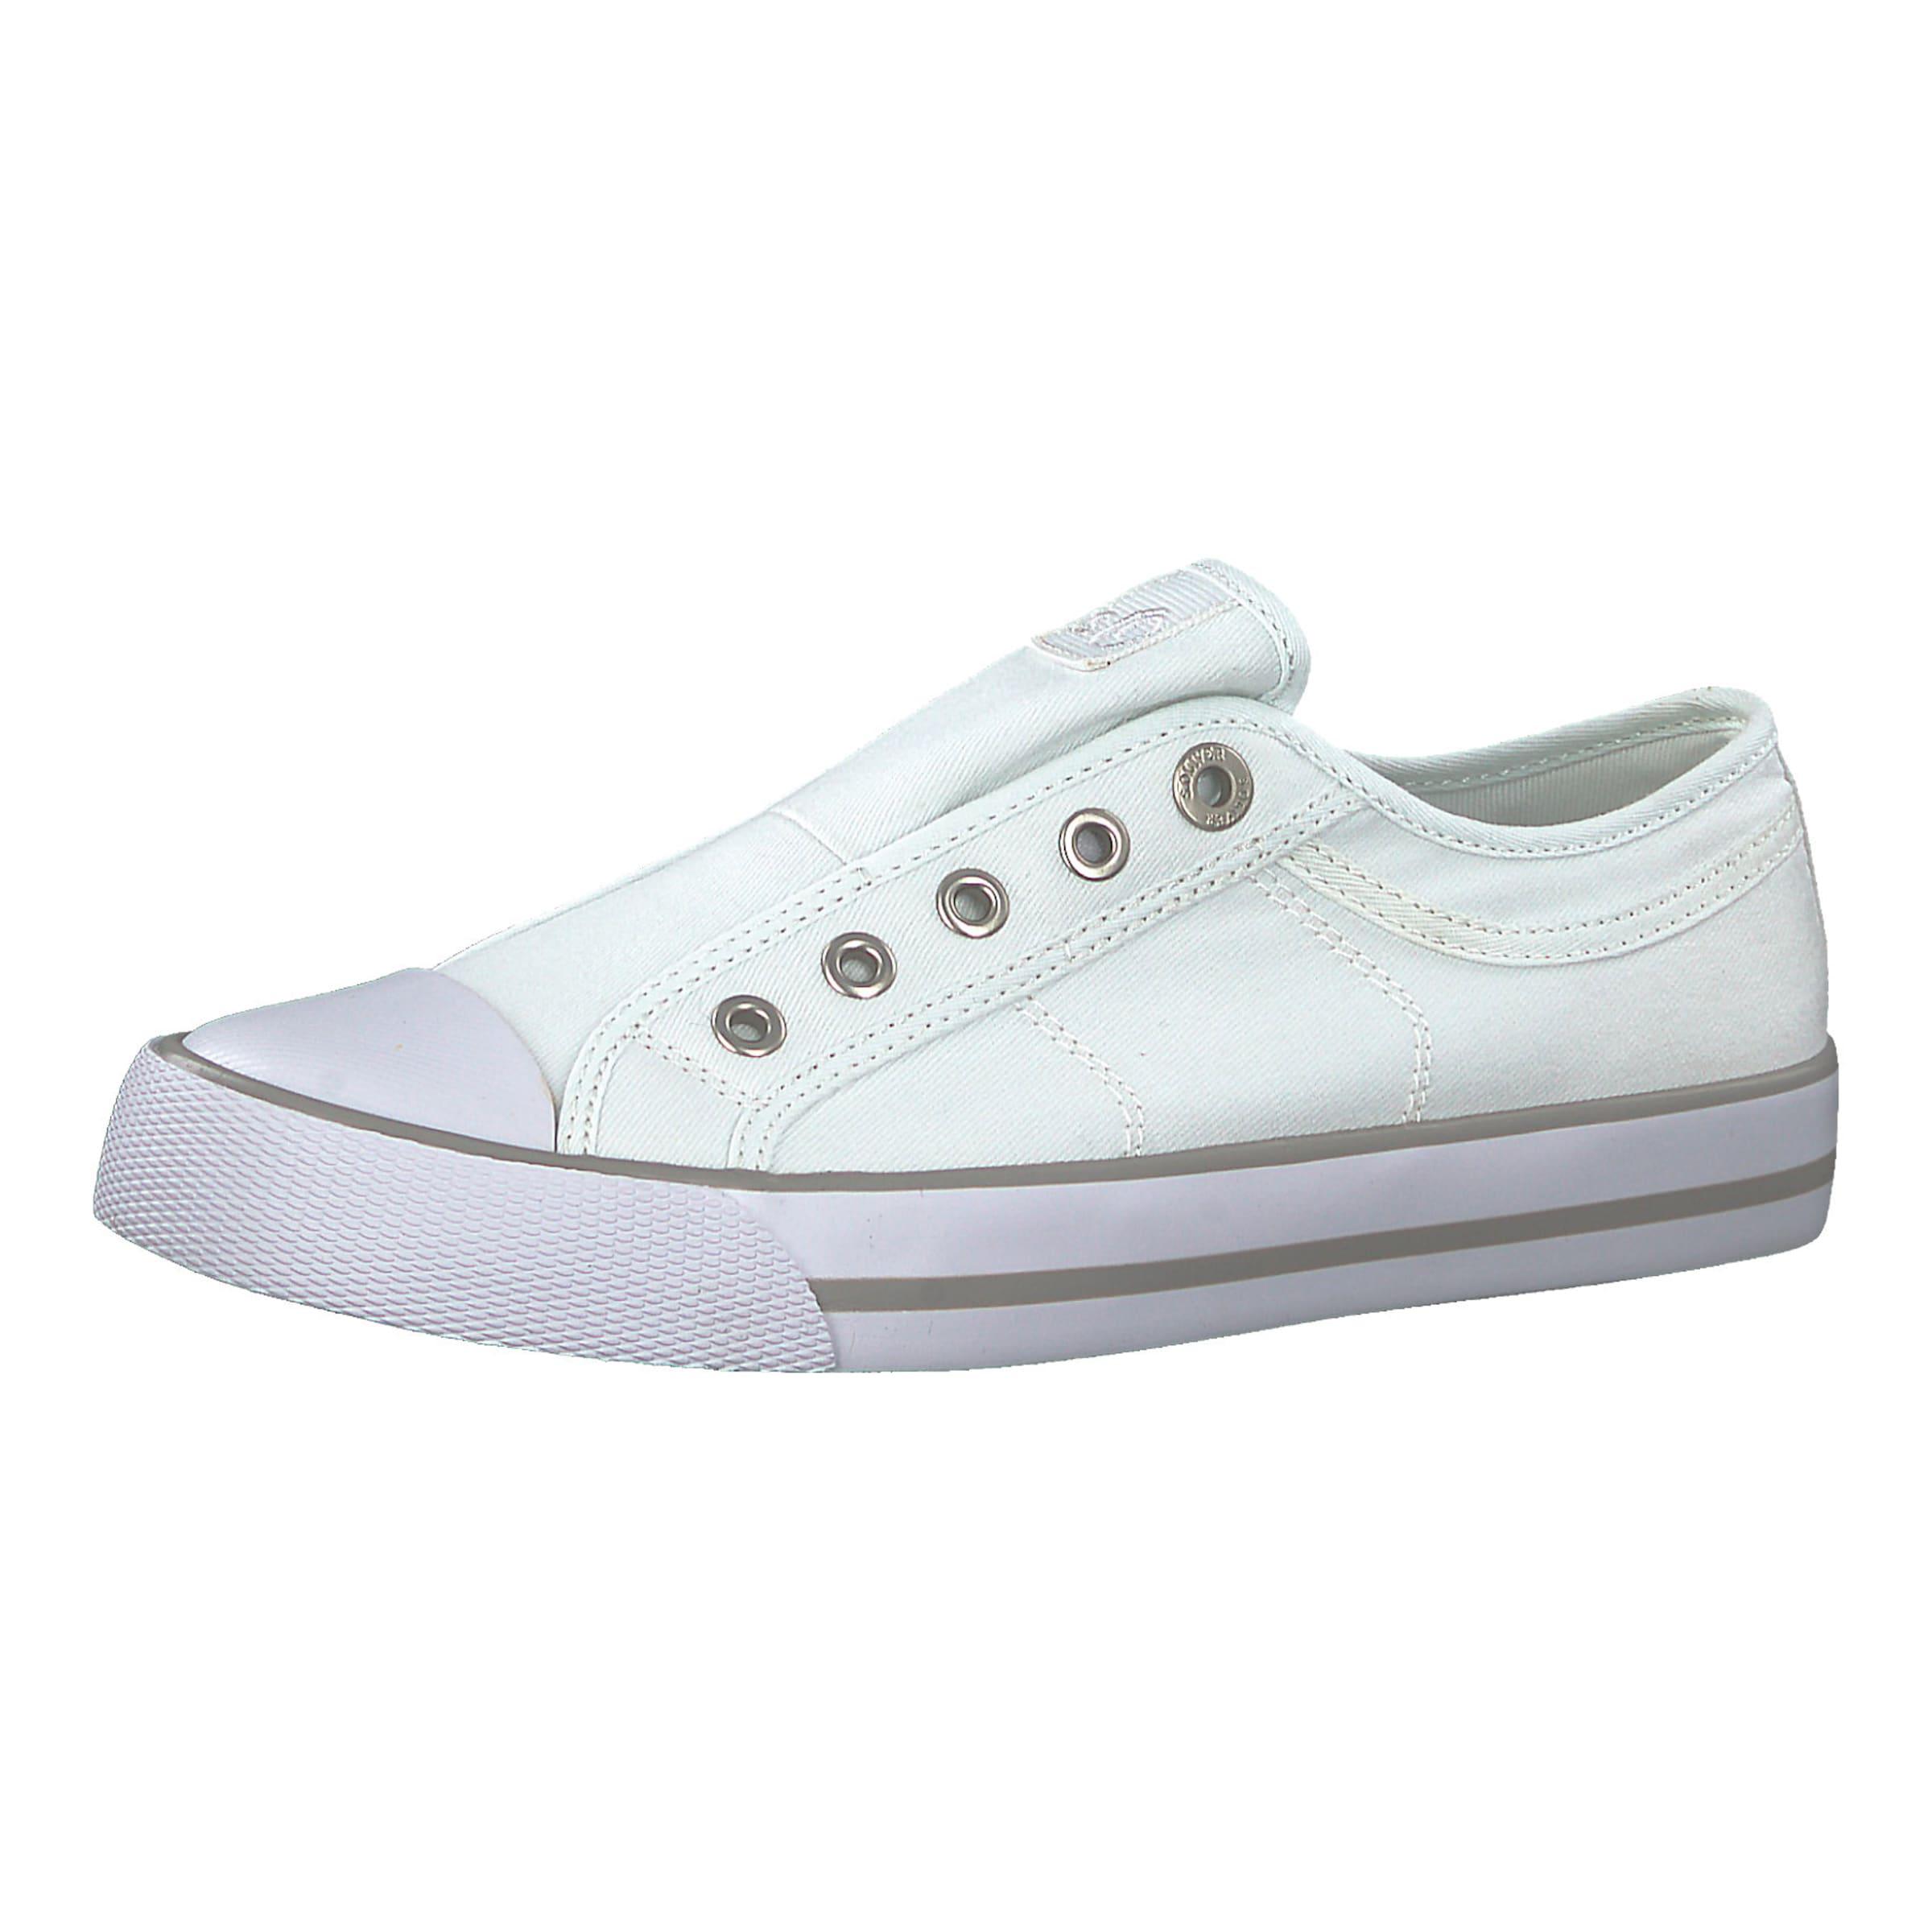 s.Oliver RED LABEL Schnürungsloser Sneaker Hohe Qualität